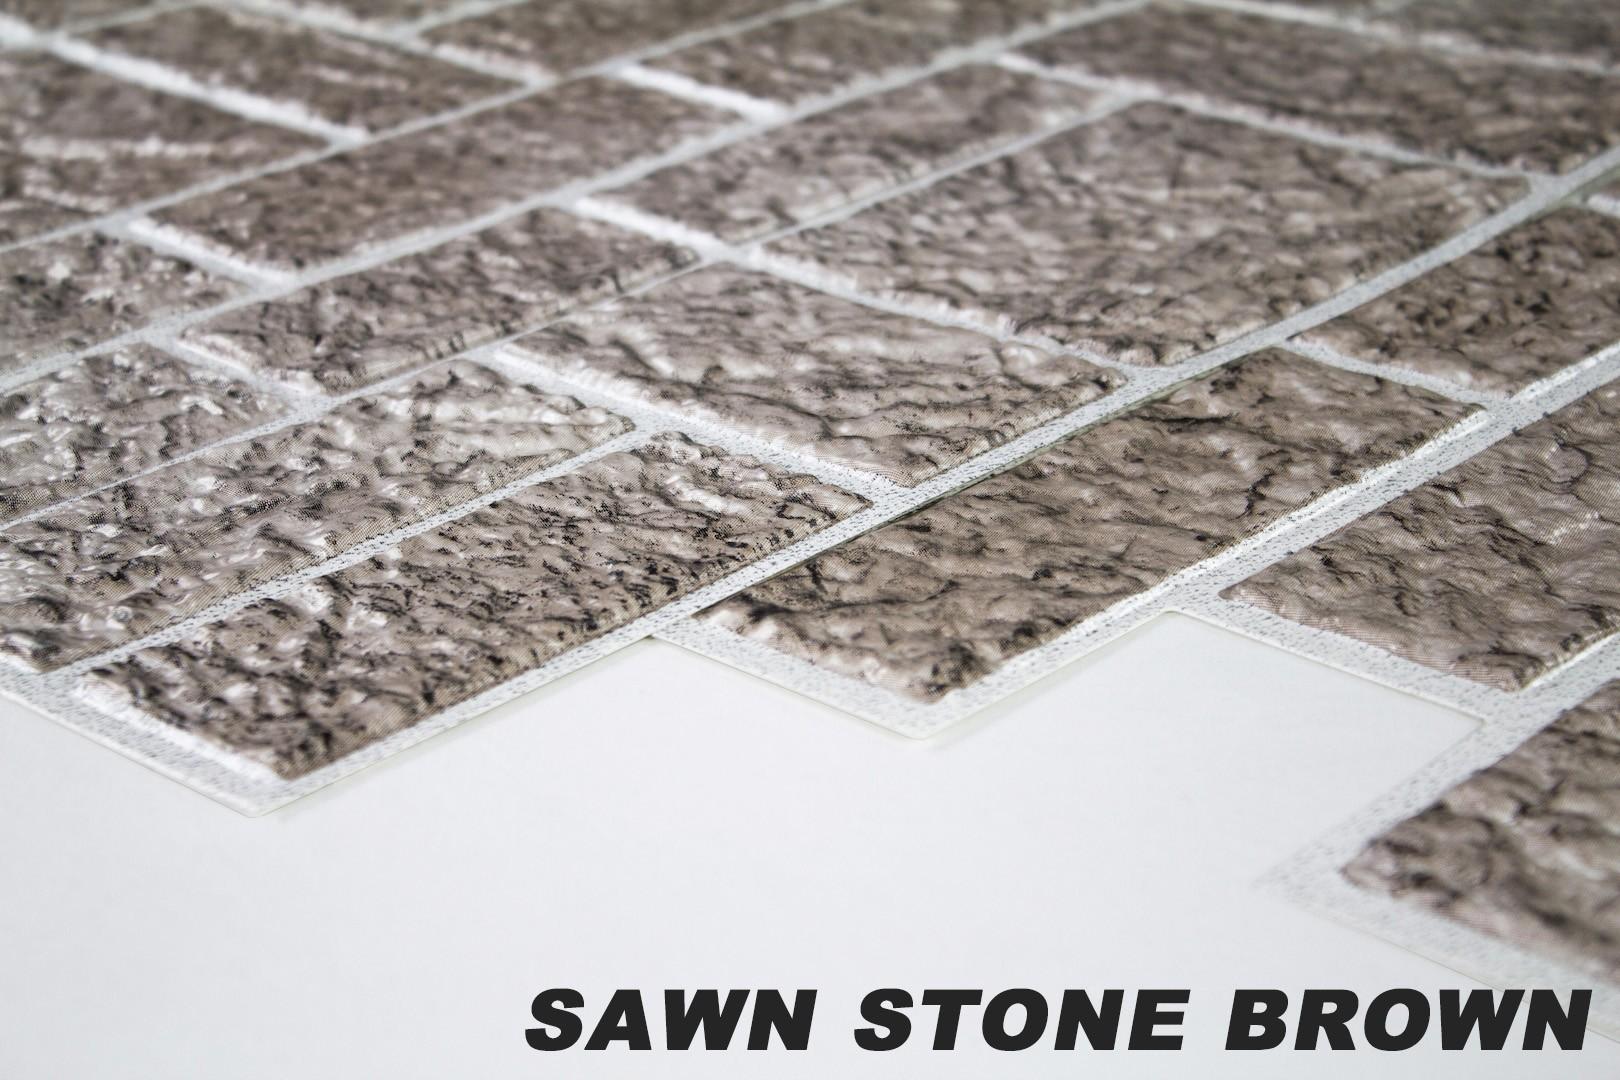 1 pvc dekorplatte mosaic wandverkleidung platten wand 95x48cm sawn stone brown wand dekorsteine pvc. Black Bedroom Furniture Sets. Home Design Ideas